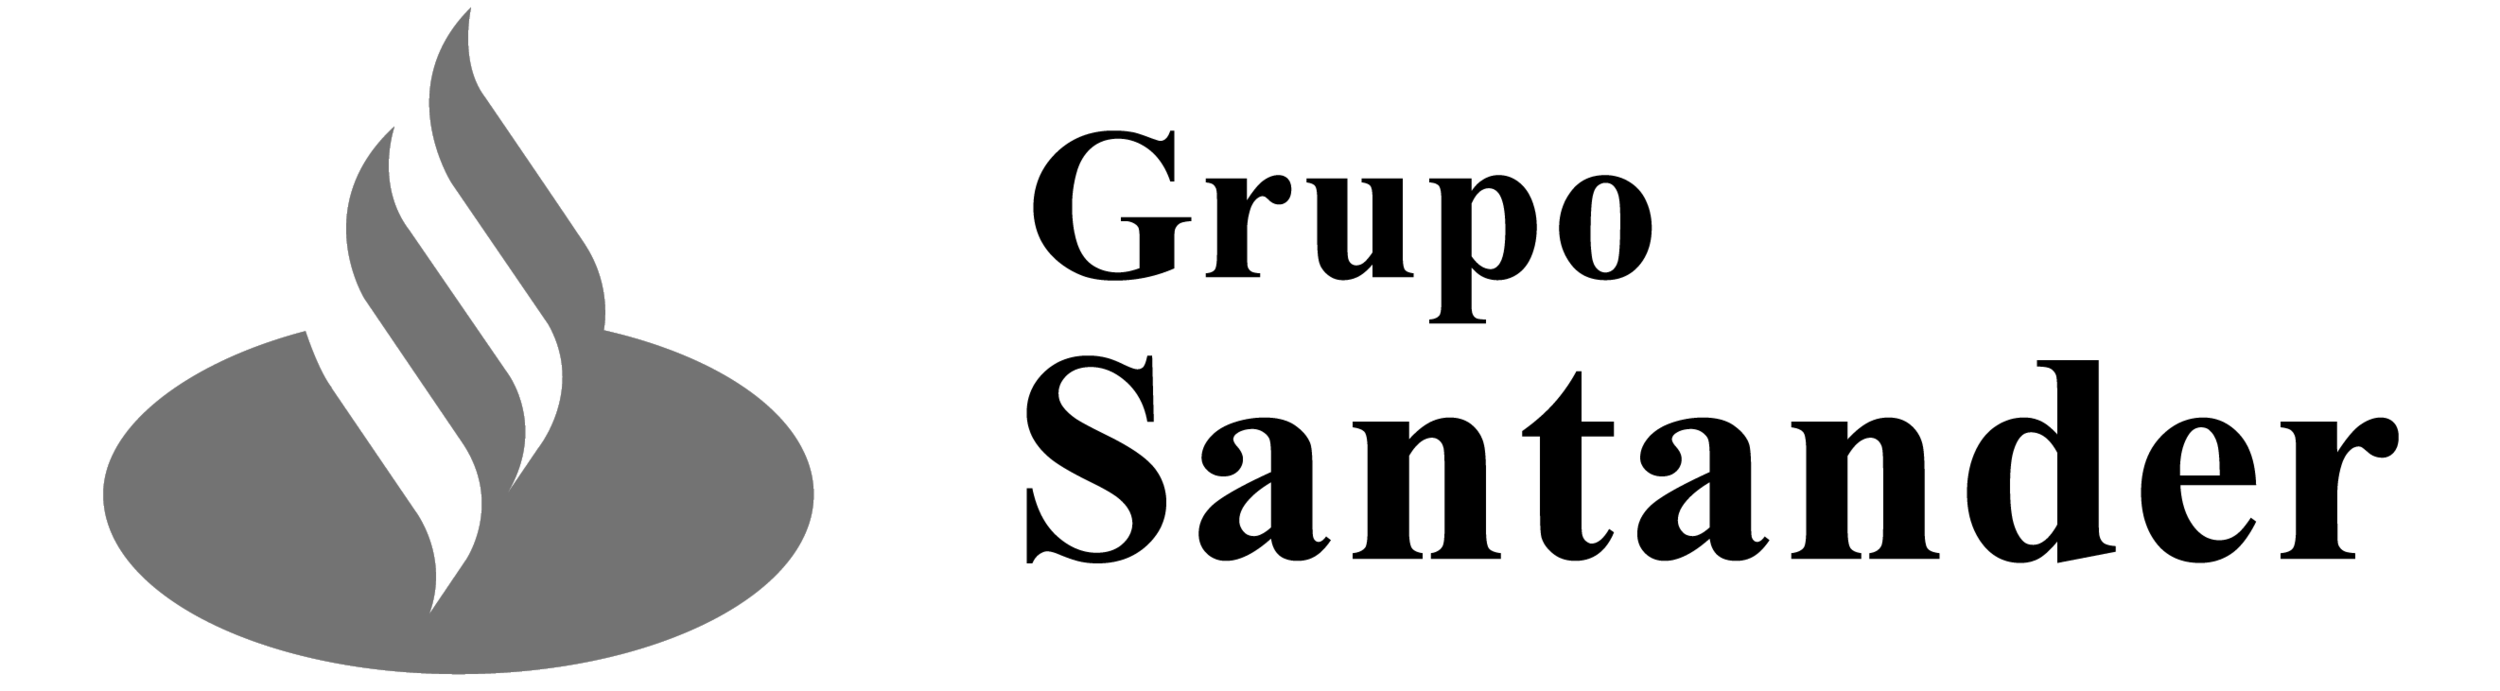 Grupo Santander Logo